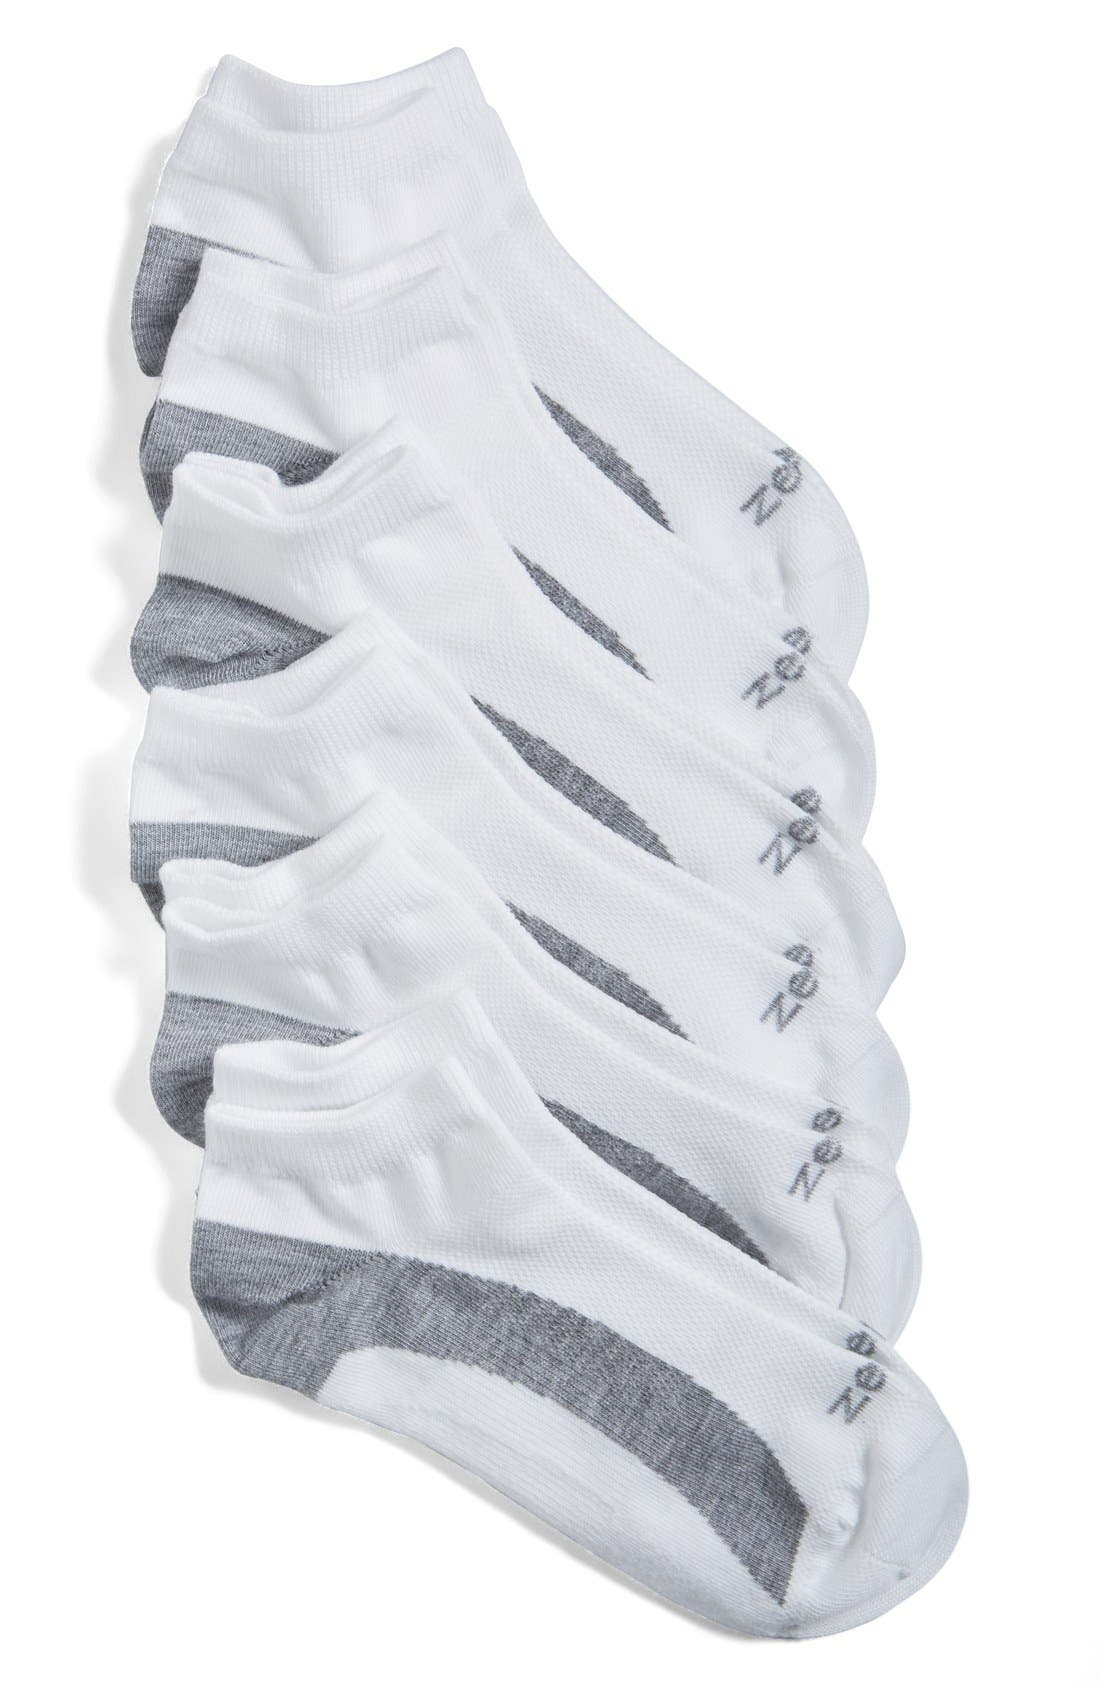 Alternate Image 1 Selected - Zella 6-Pack Liner Socks